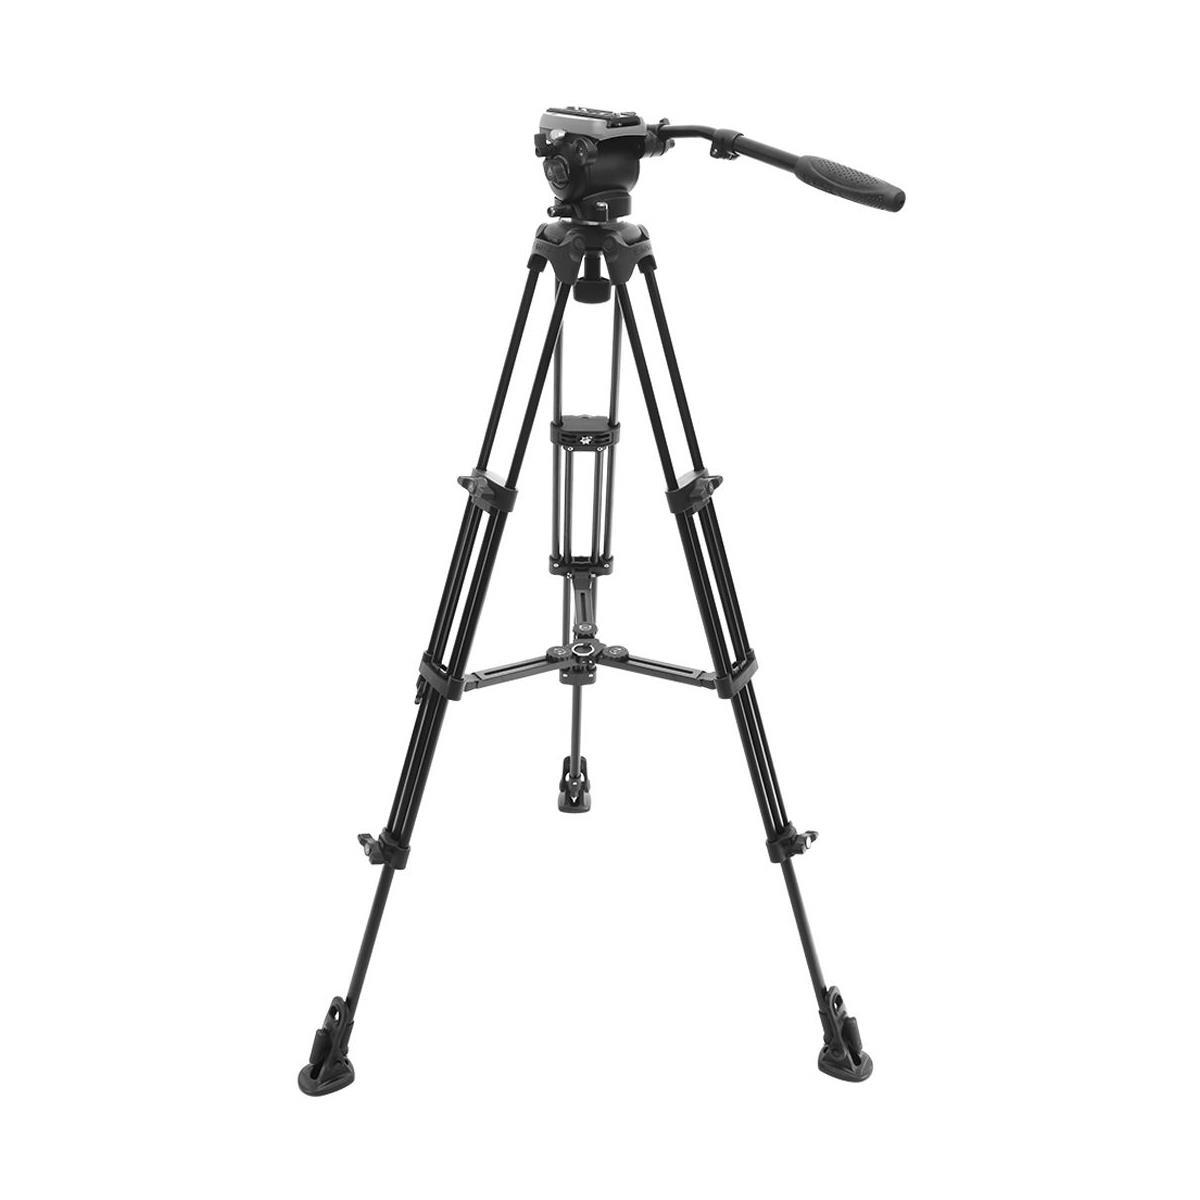 E-Image EK650 Professional Compact Tripod with Fluid Head (75mm)